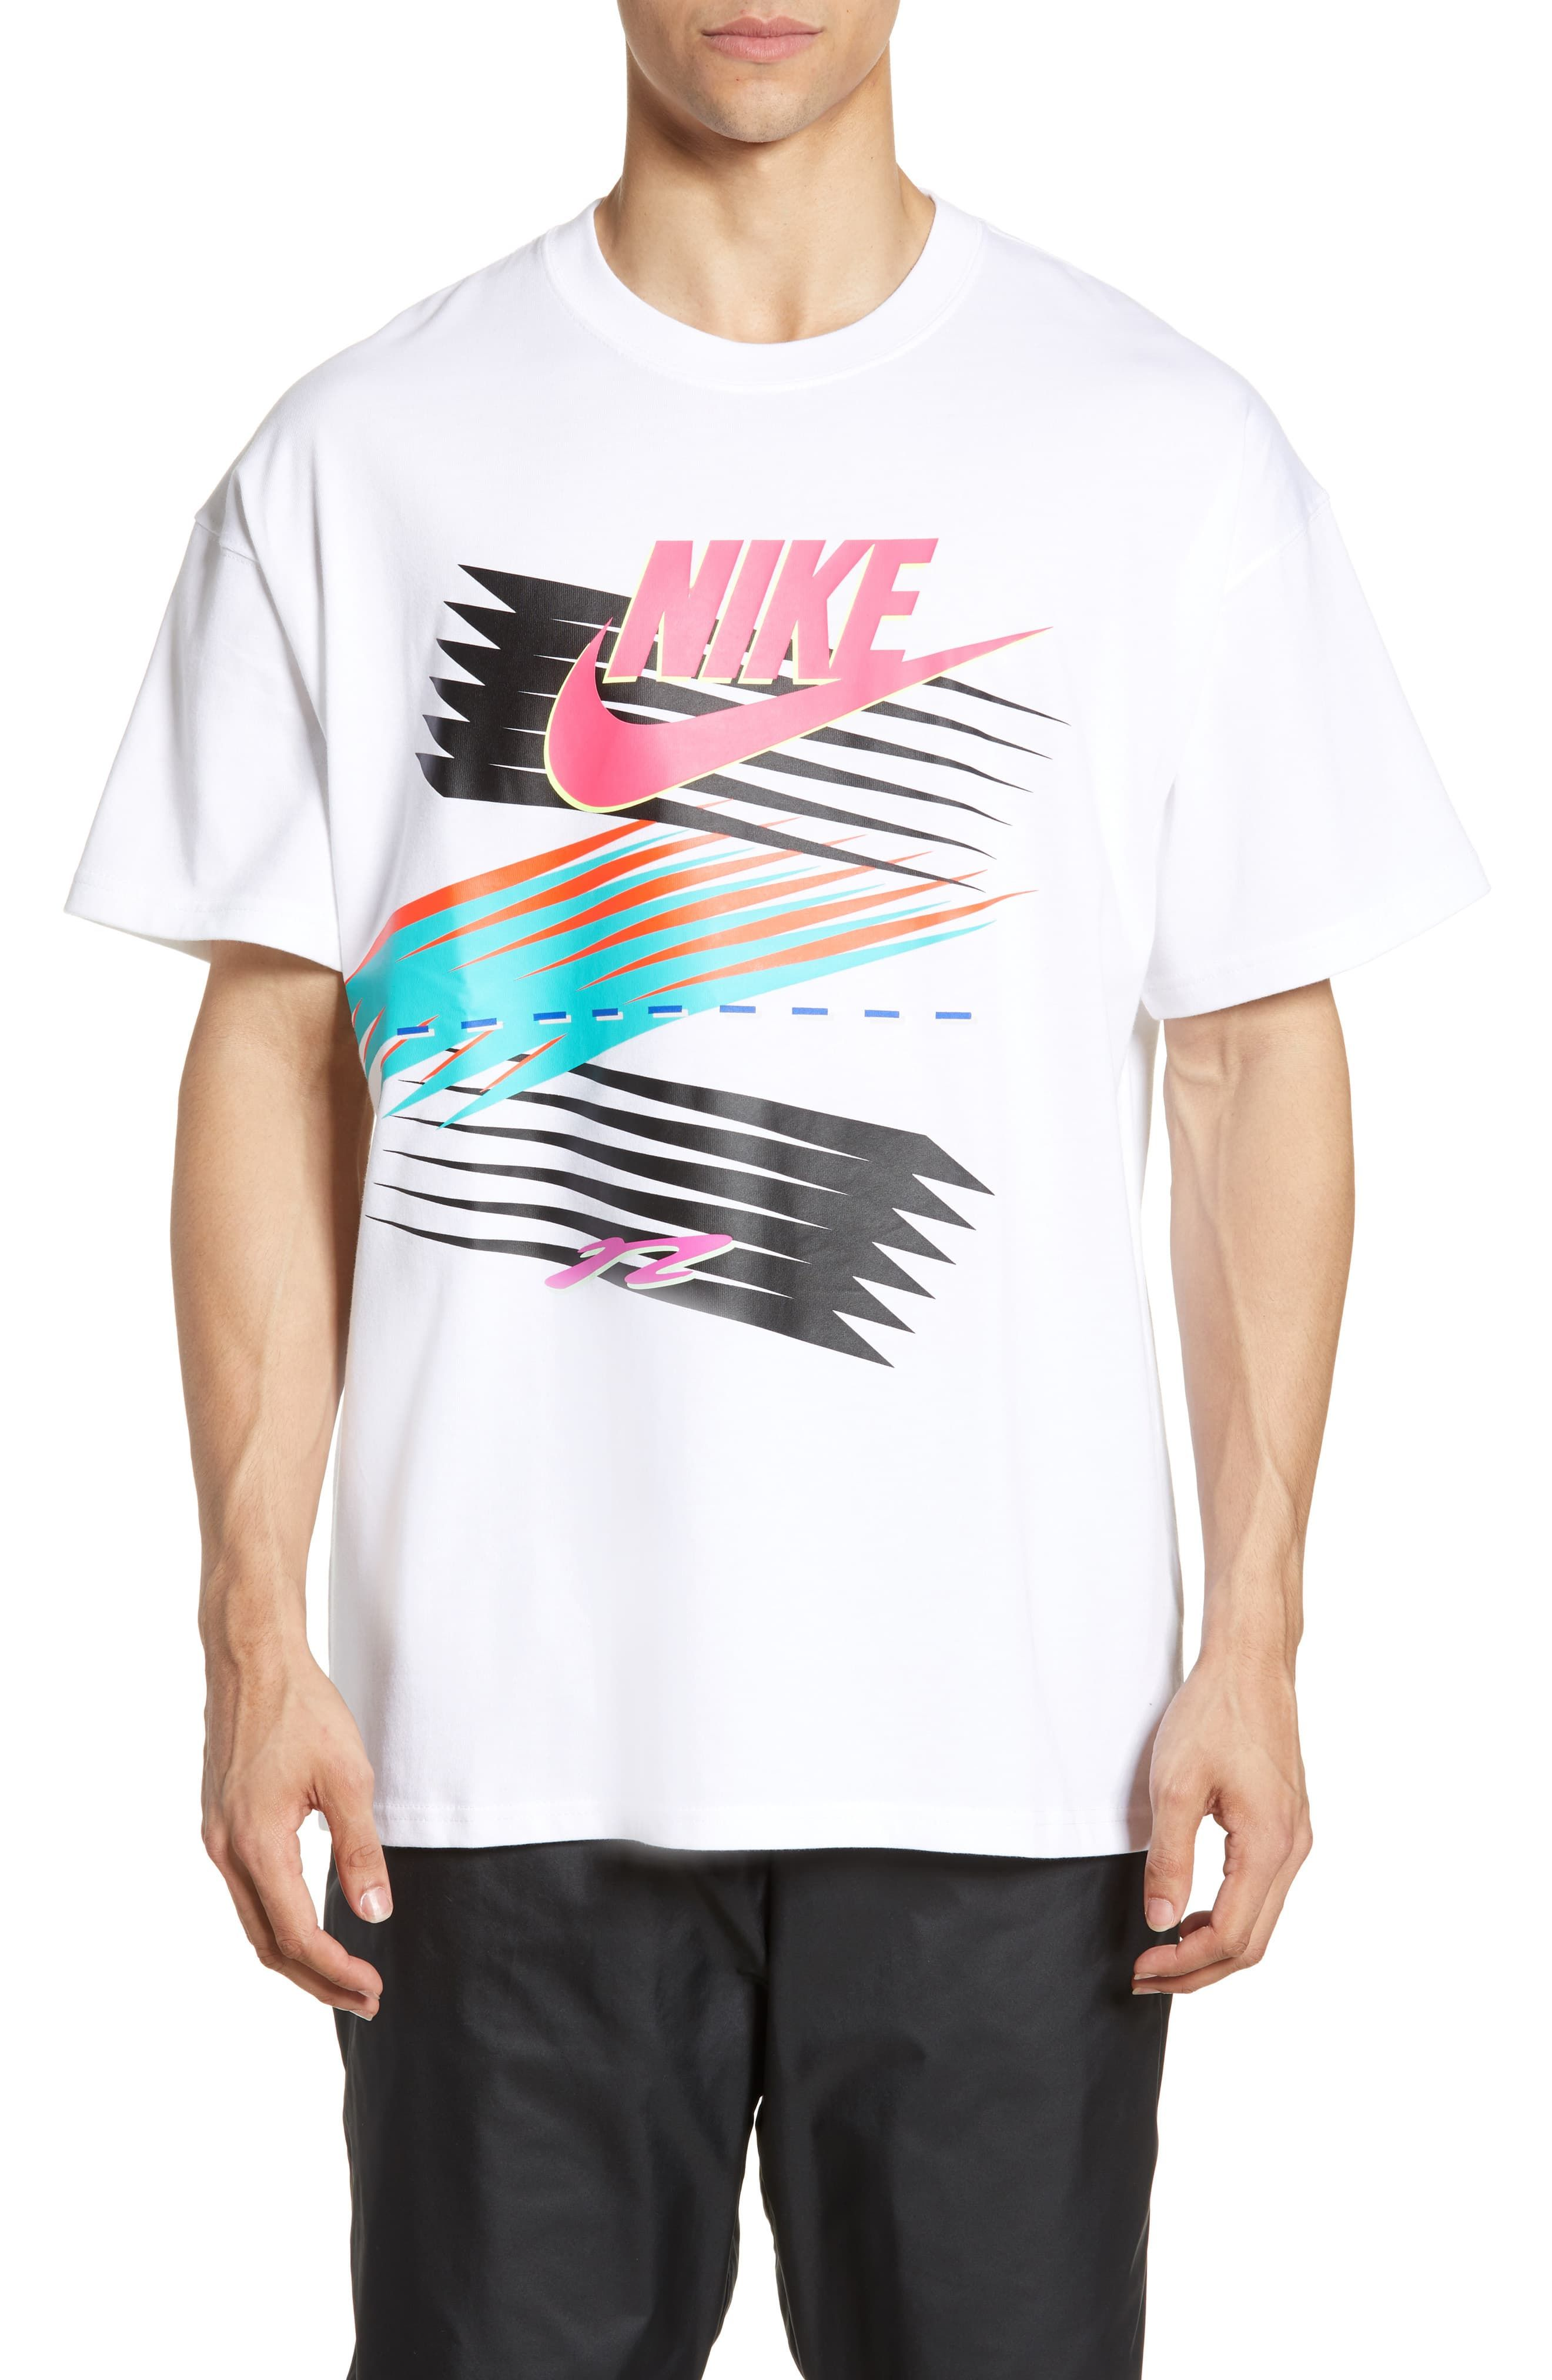 Men's Nike X Atmos Men's T Shirt, Size Small White in 2020